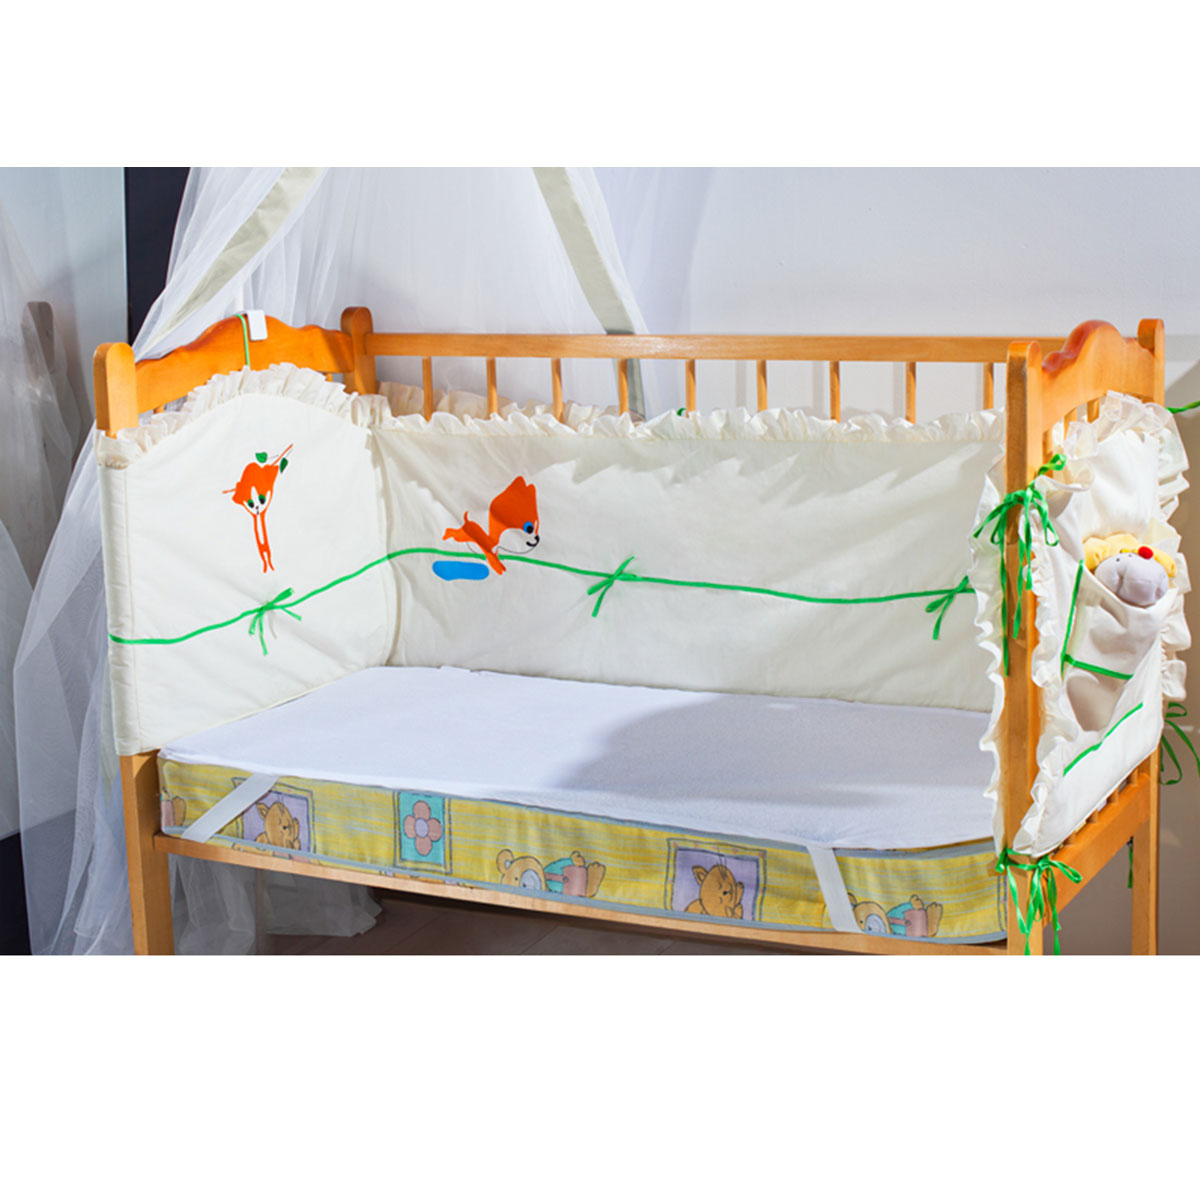 Наматрасник Primavelle Луиза, непромокаемый, цвет: белый, 60 см х 120 см sweet baby наматрасник непромокаемый sb k013